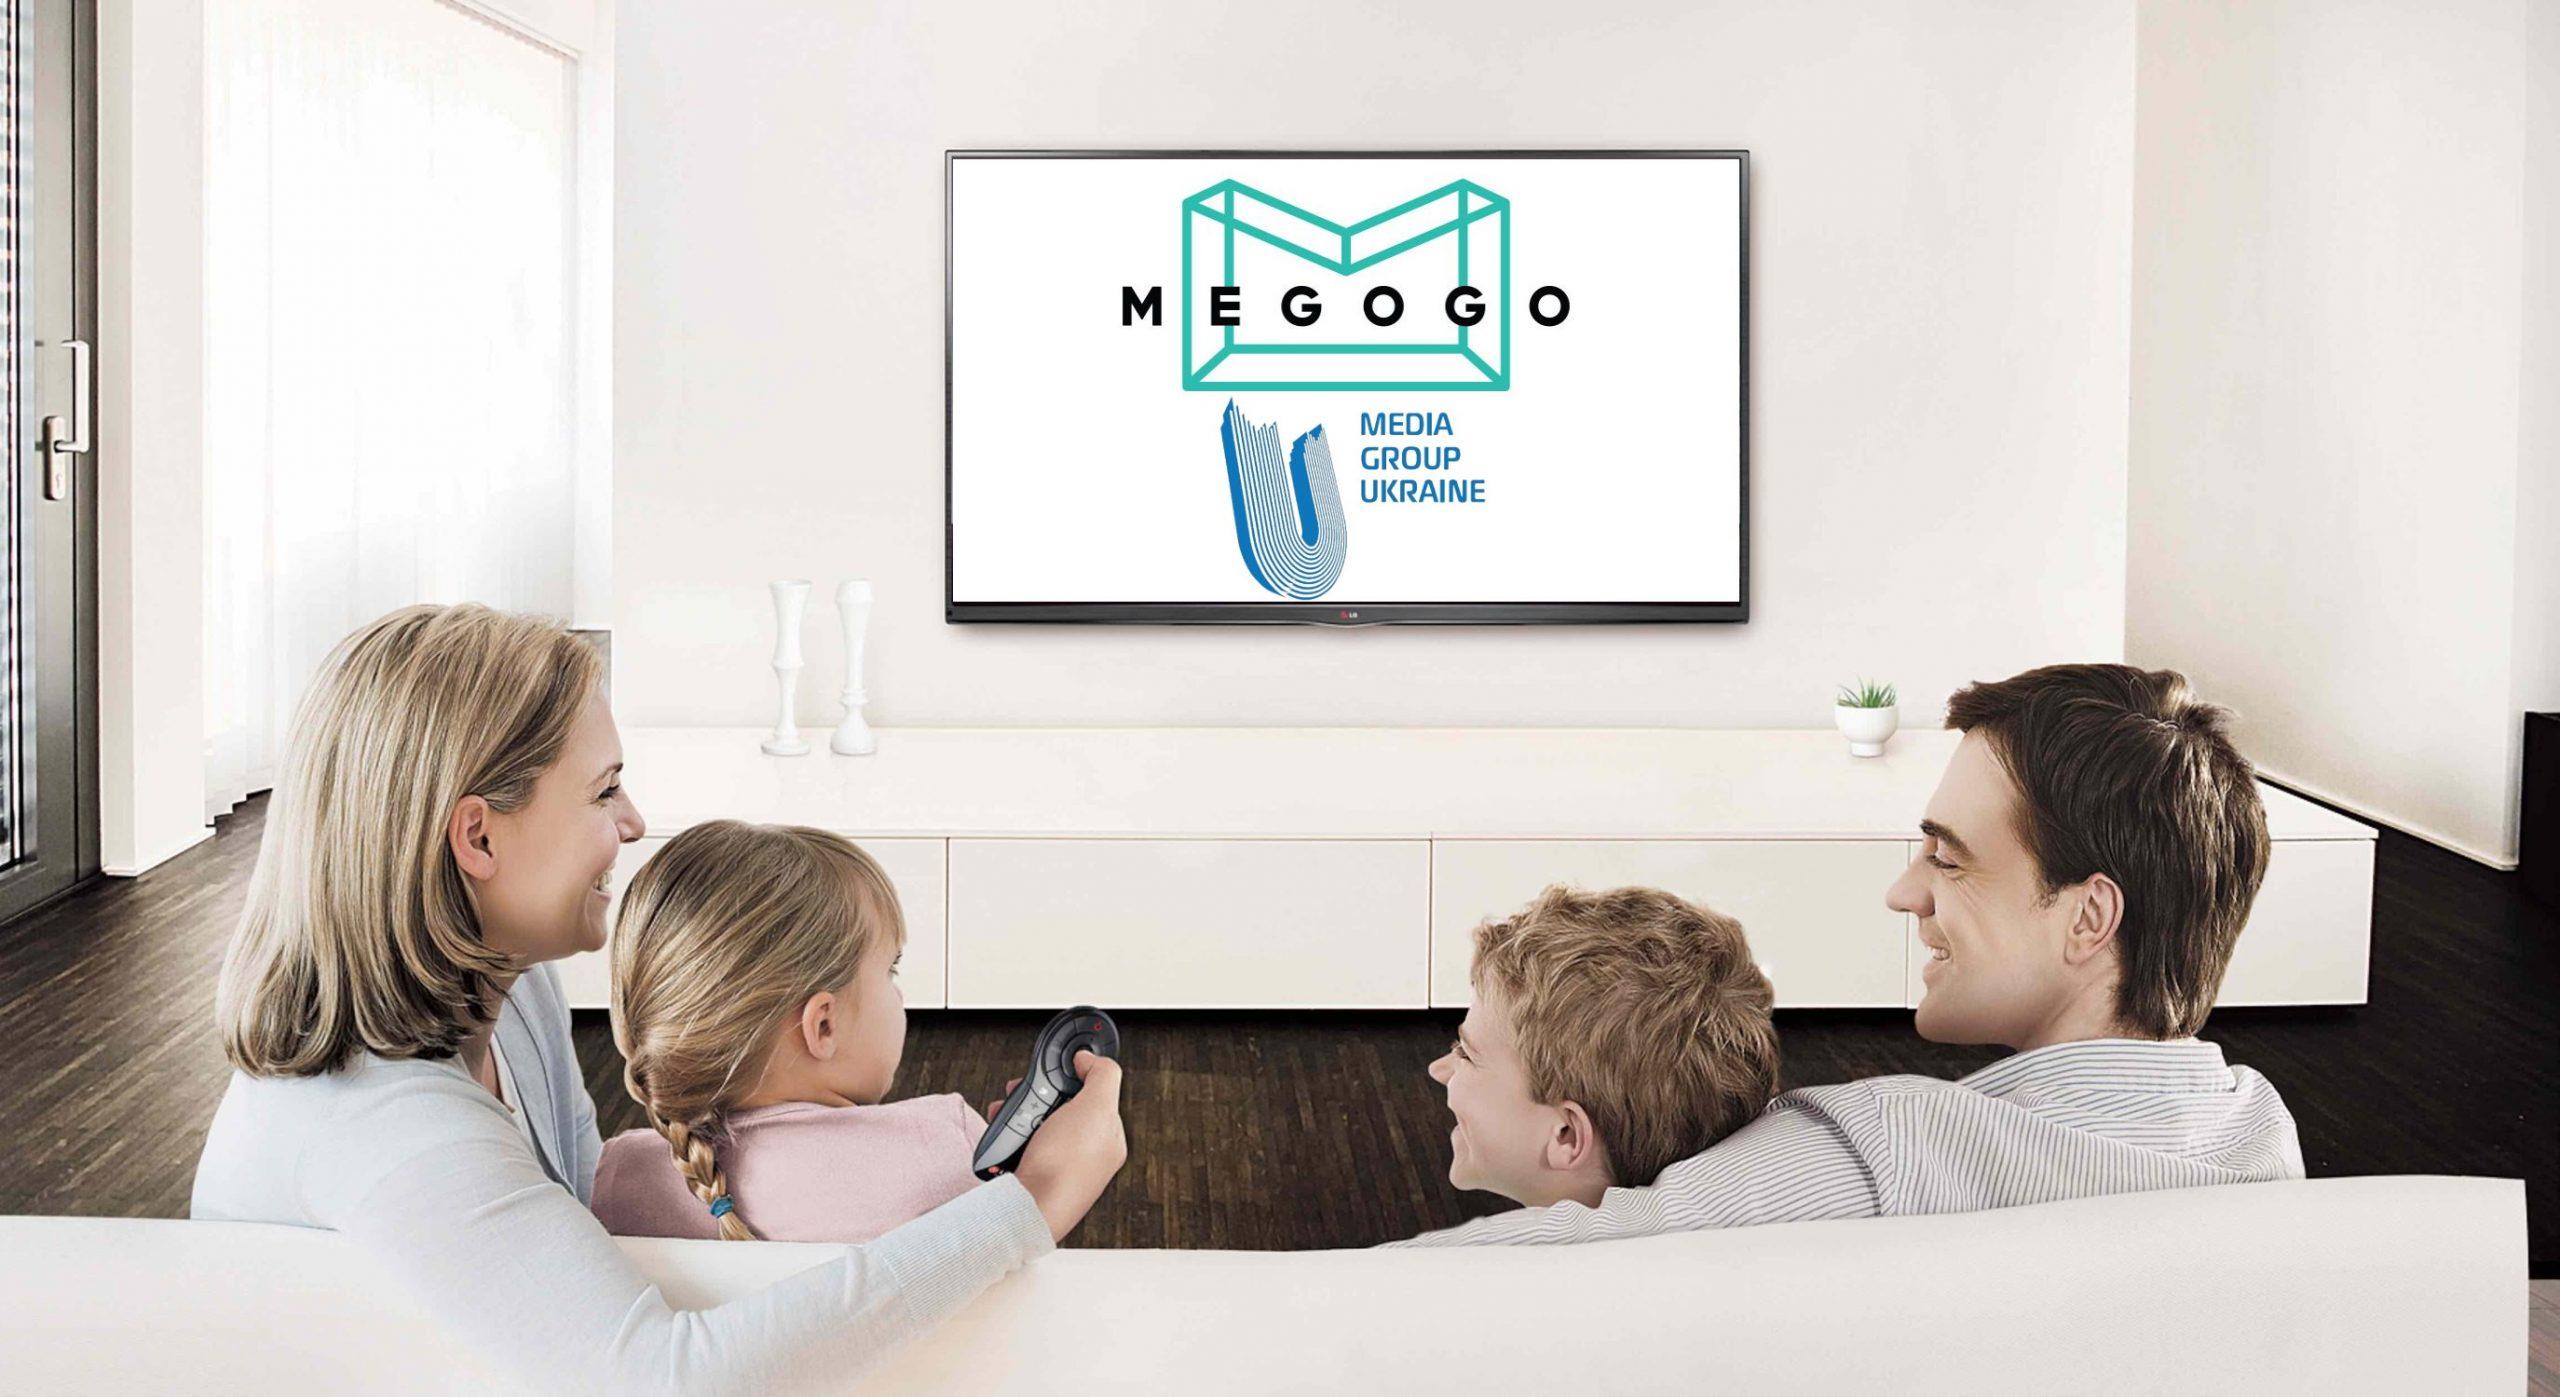 Megogo и Медиа Группа Украина